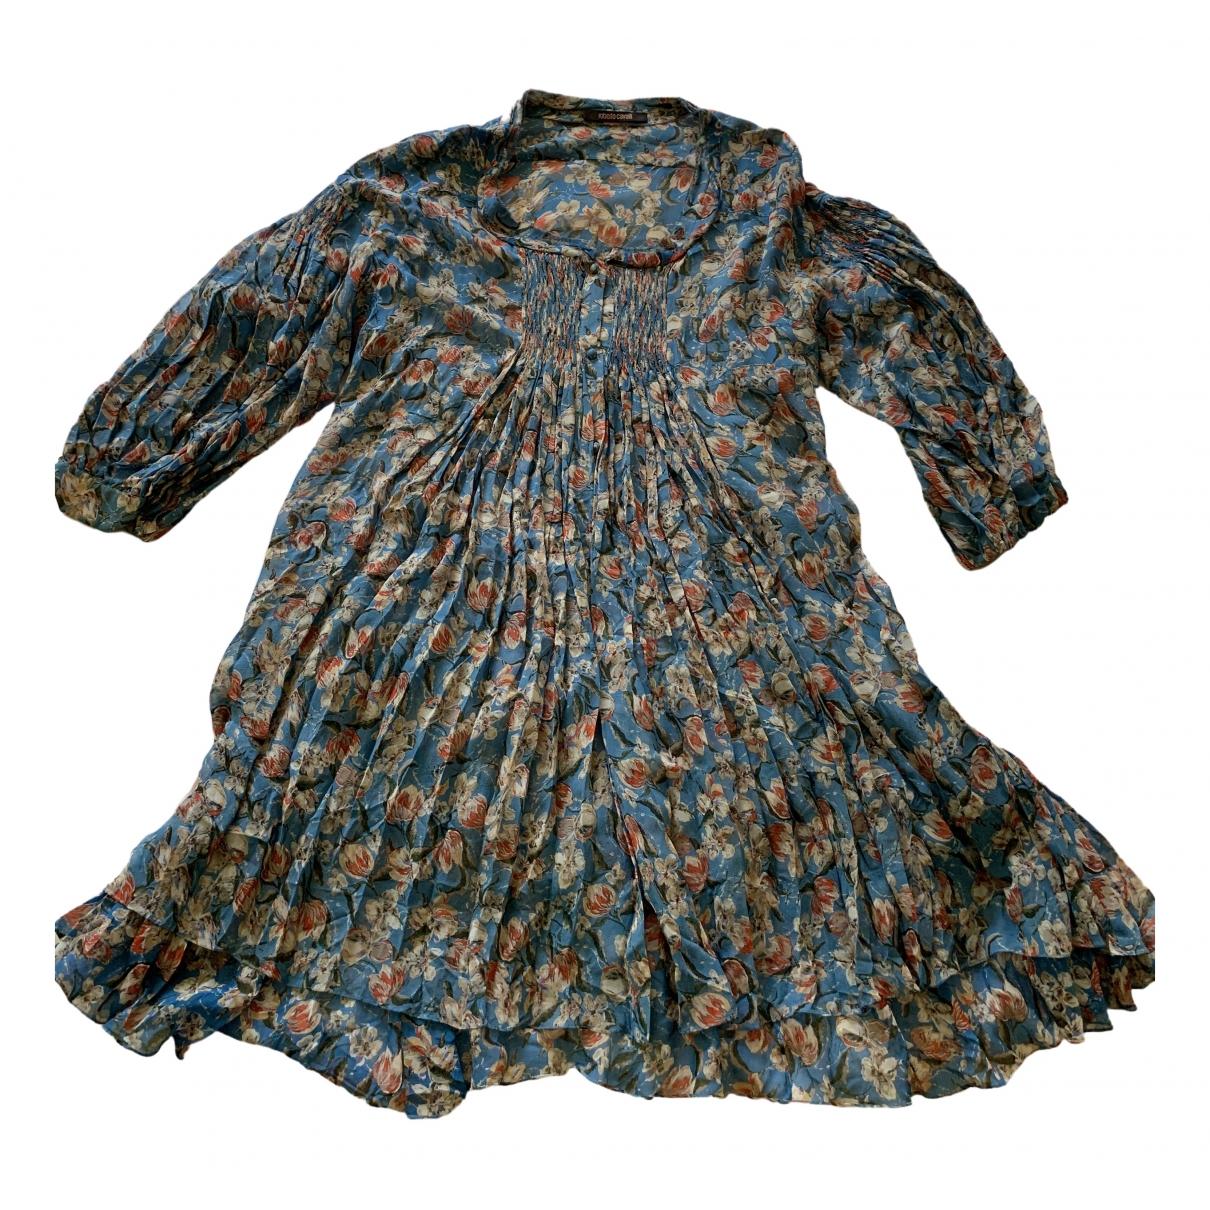 Roberto Cavalli \N Silk dress for Women 42 IT